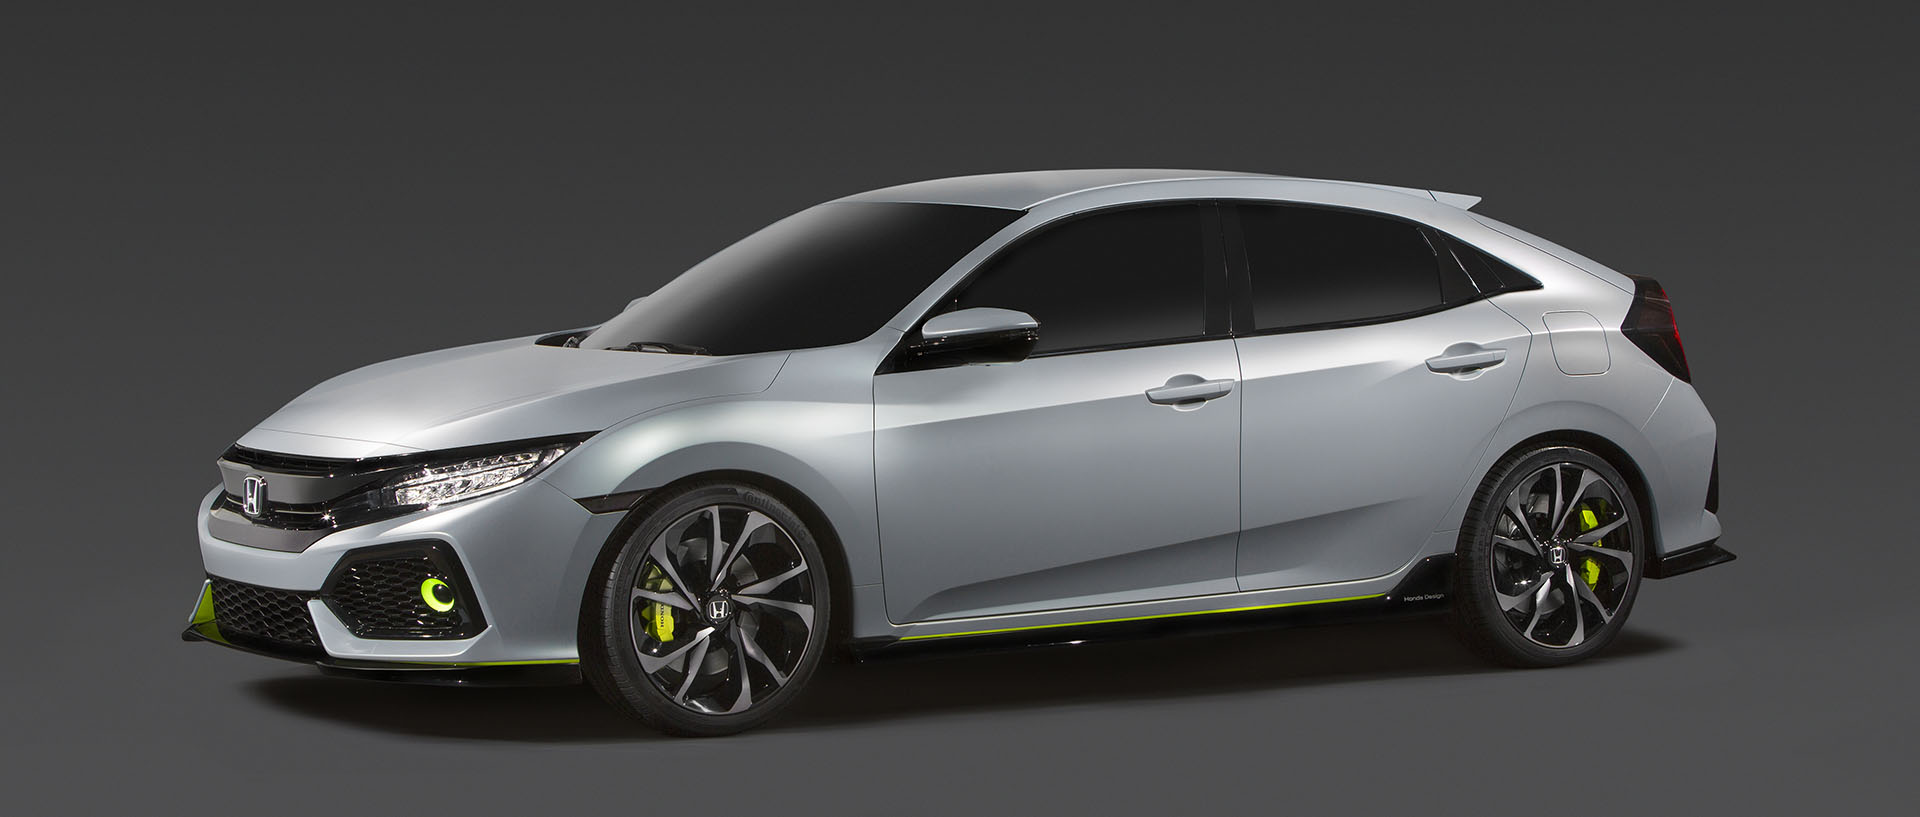 2017 Honda Civic Hatchback Joins Coupe And Sedan